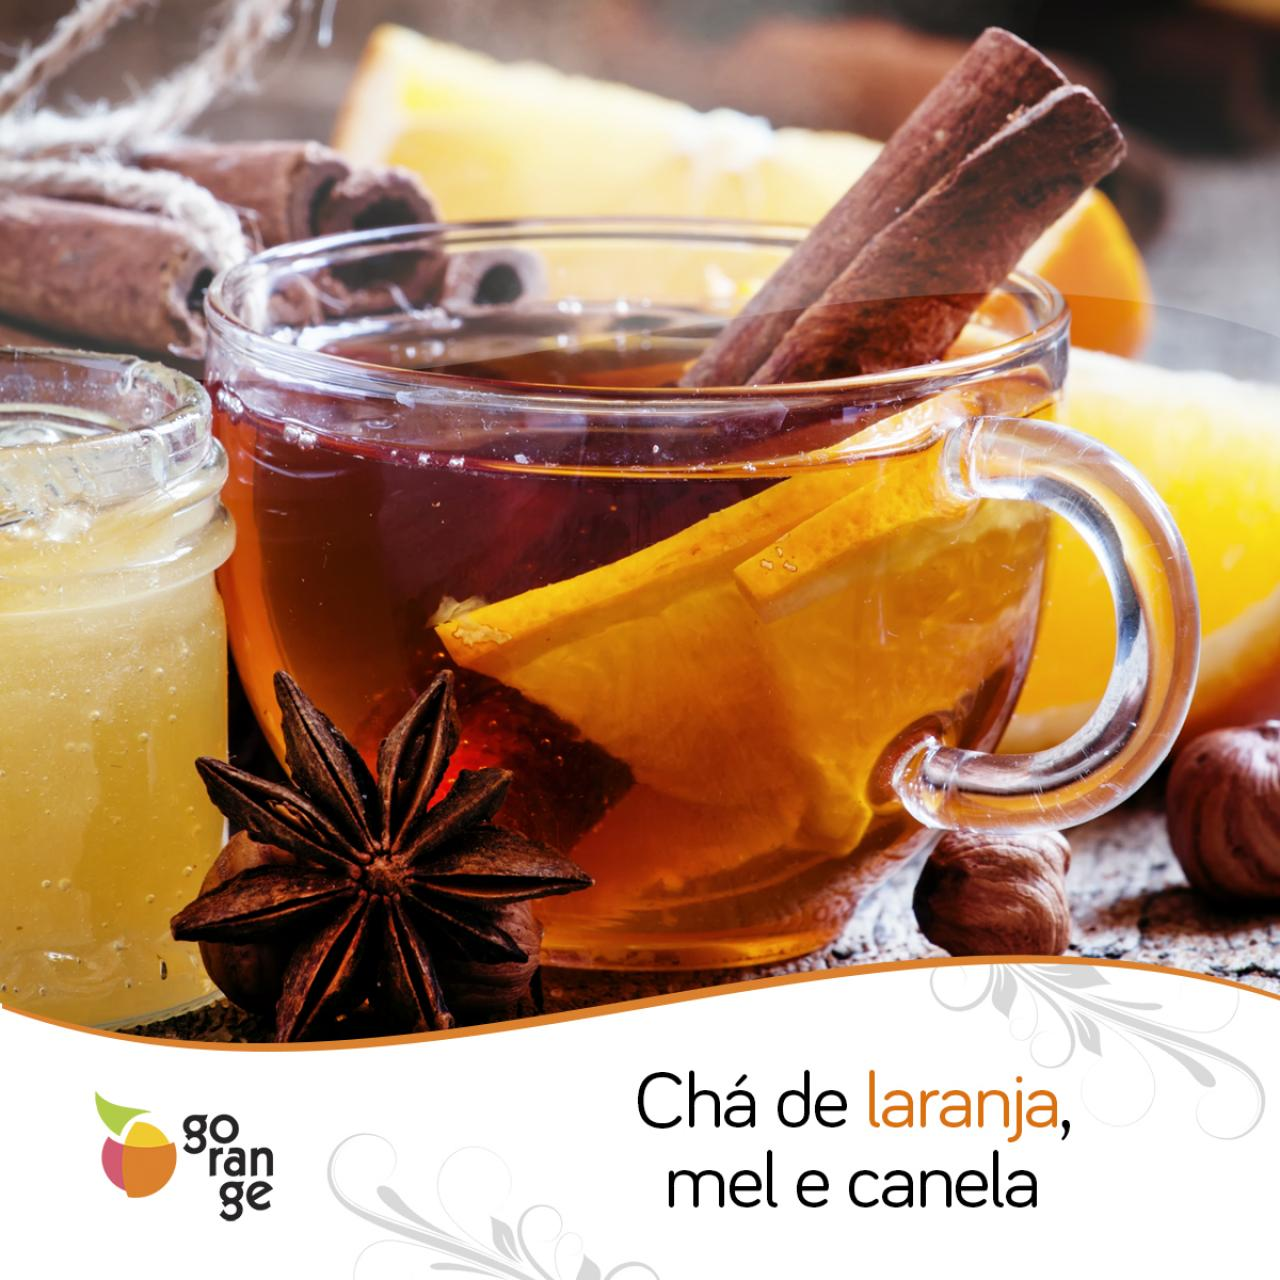 Chá de laranja, mel e canela